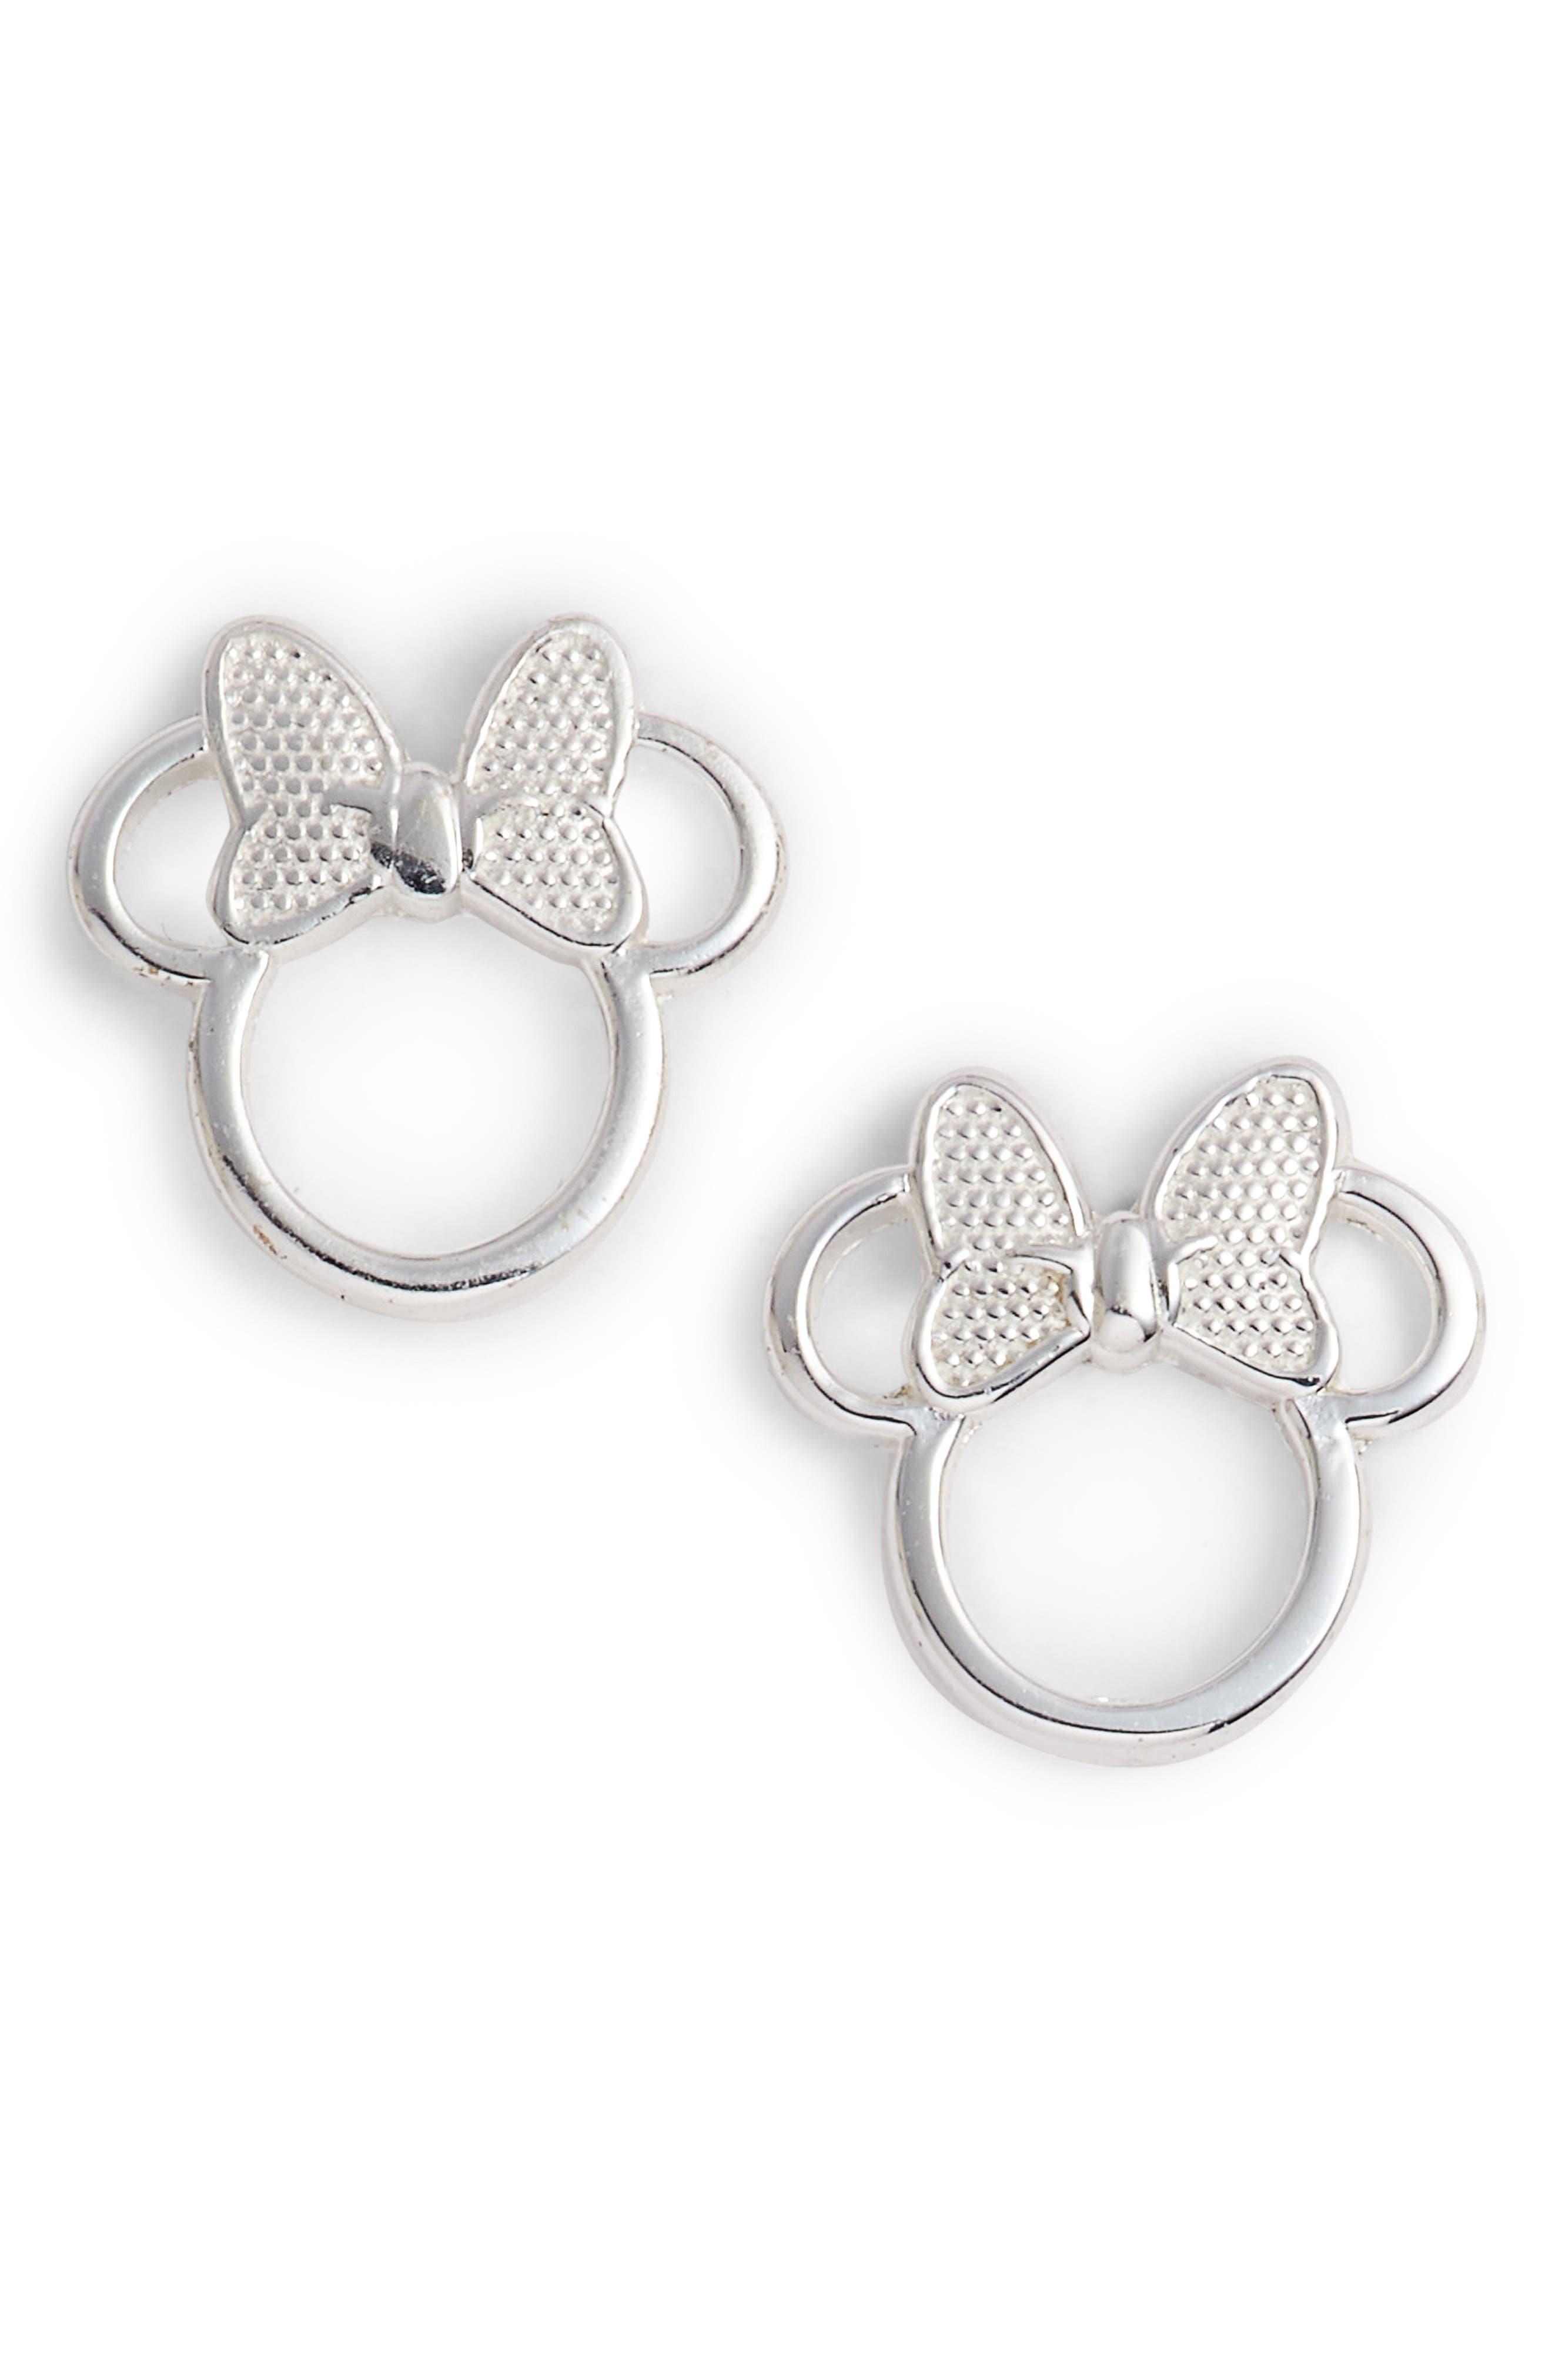 DISNEY Minnie Mouse Stud Earrings, Main, color, 040